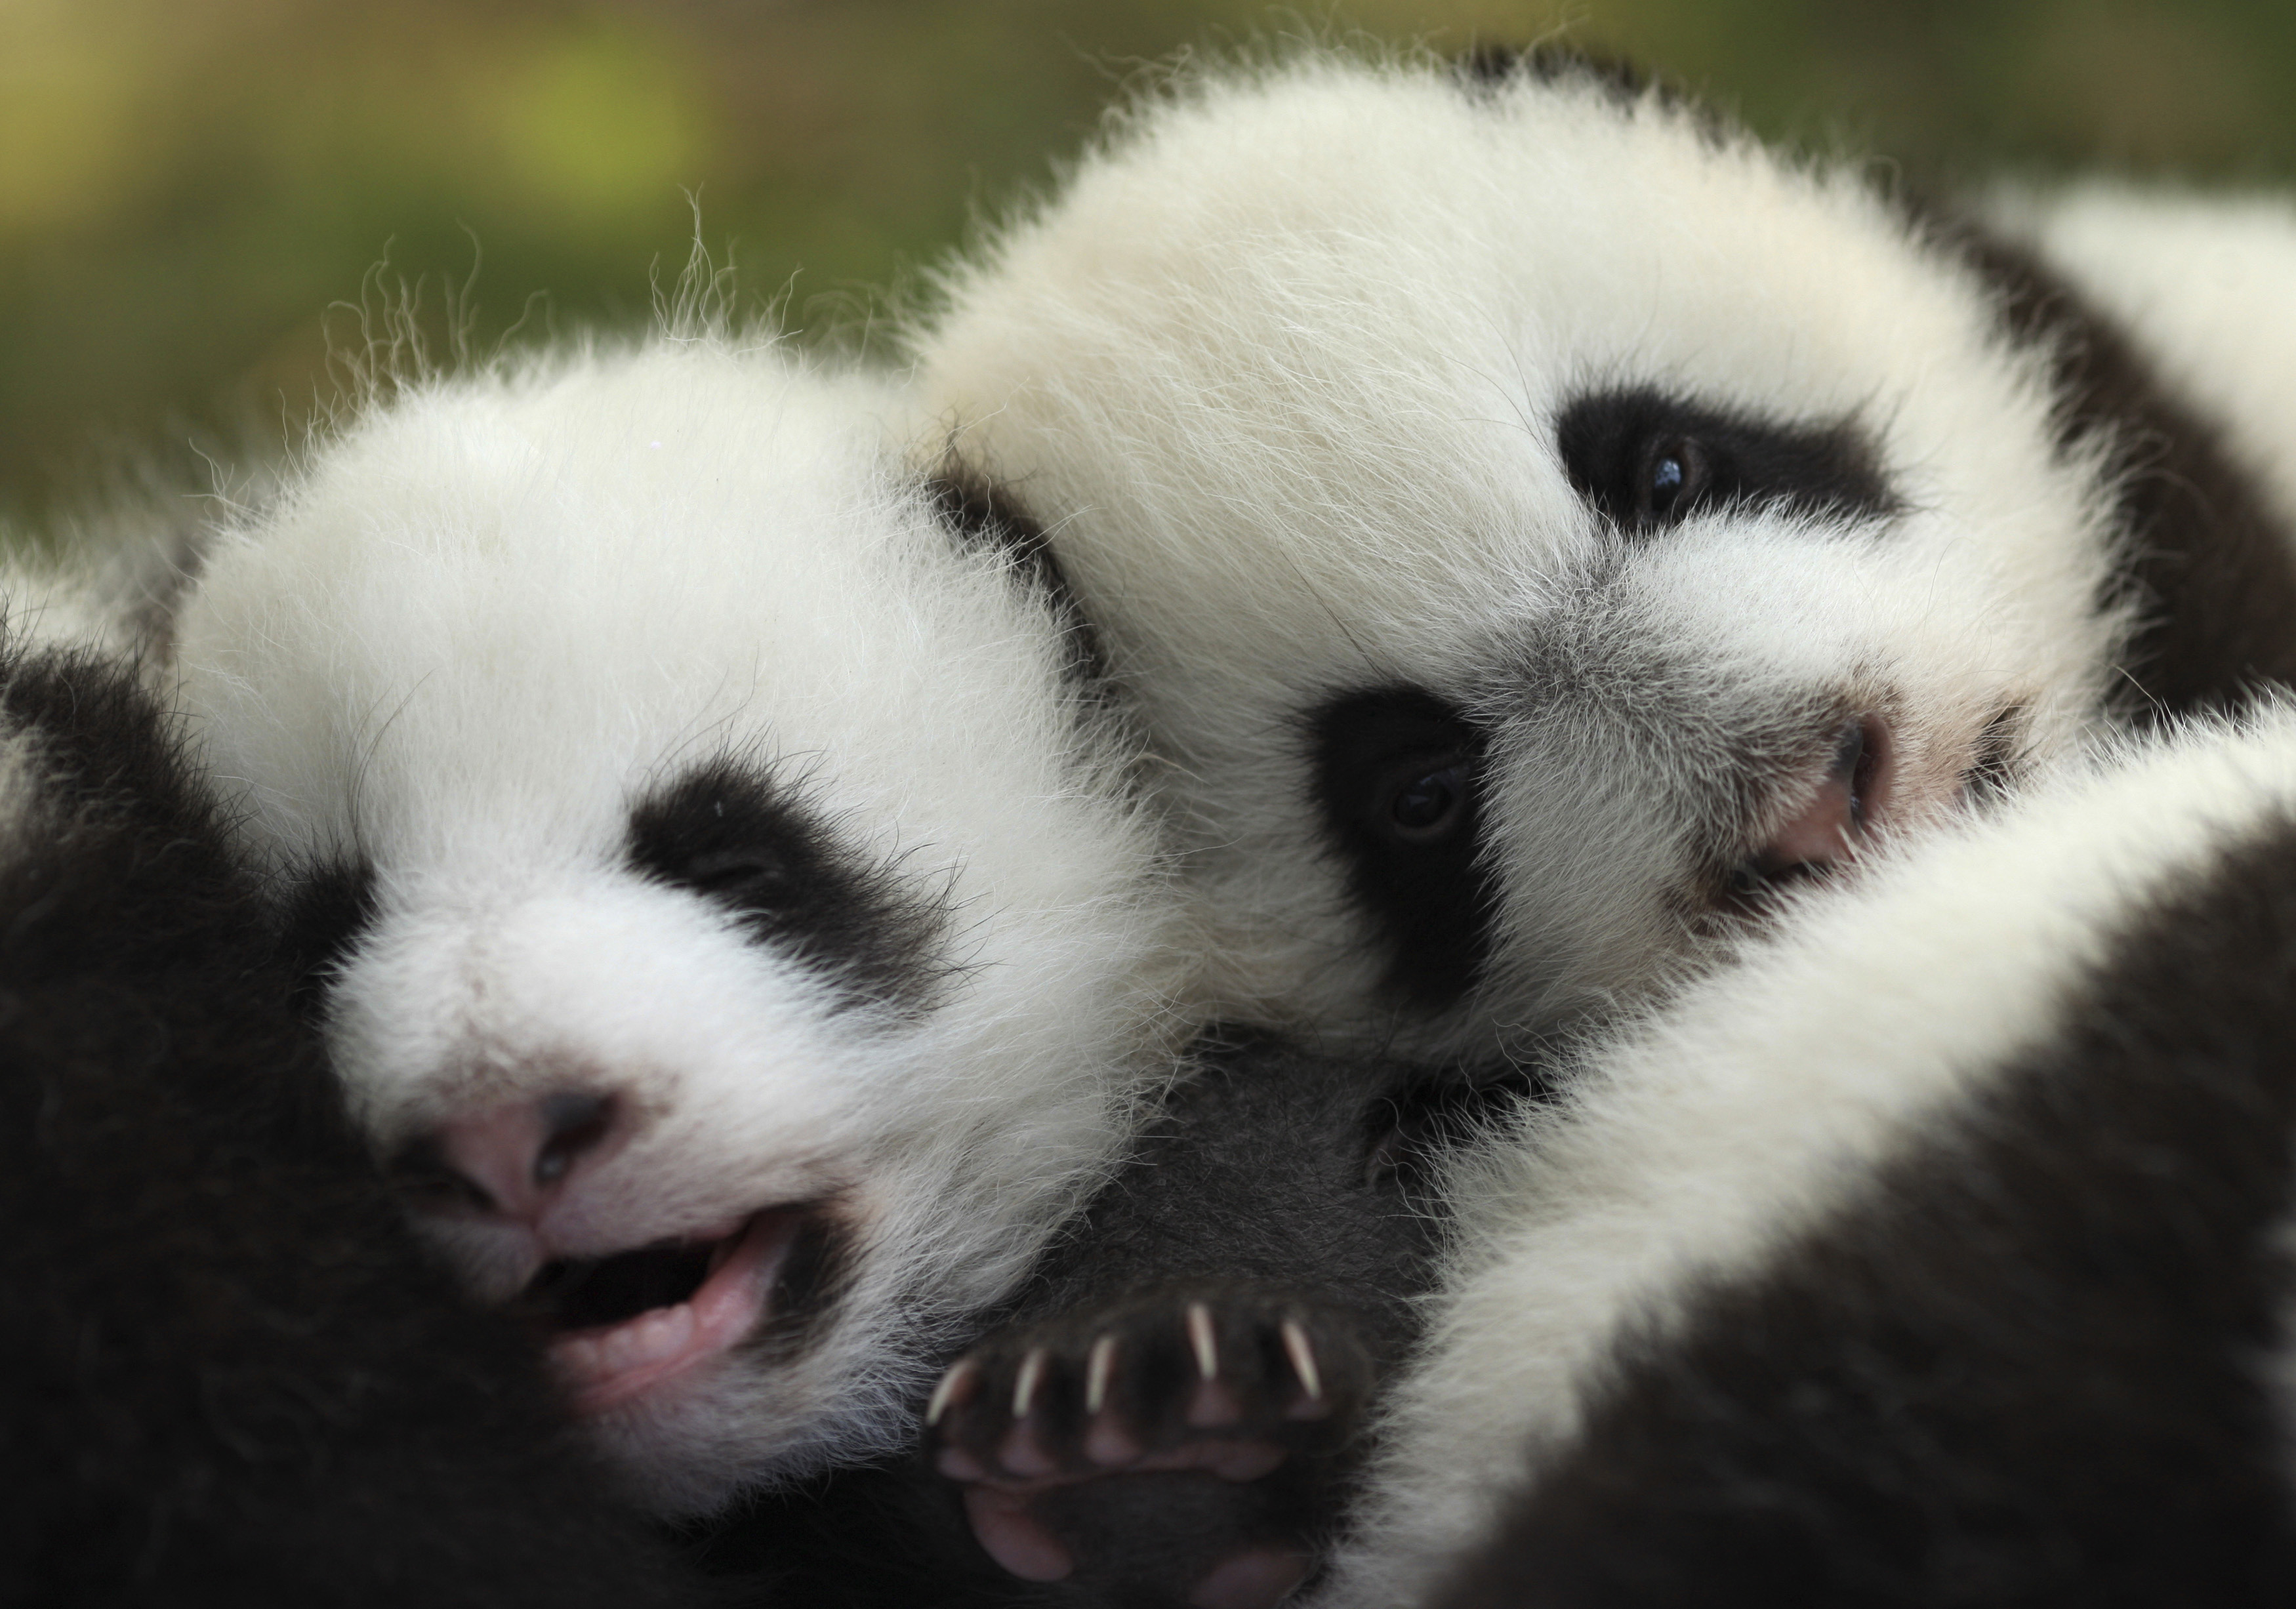 Giant-panda-no-longer-endangered-species